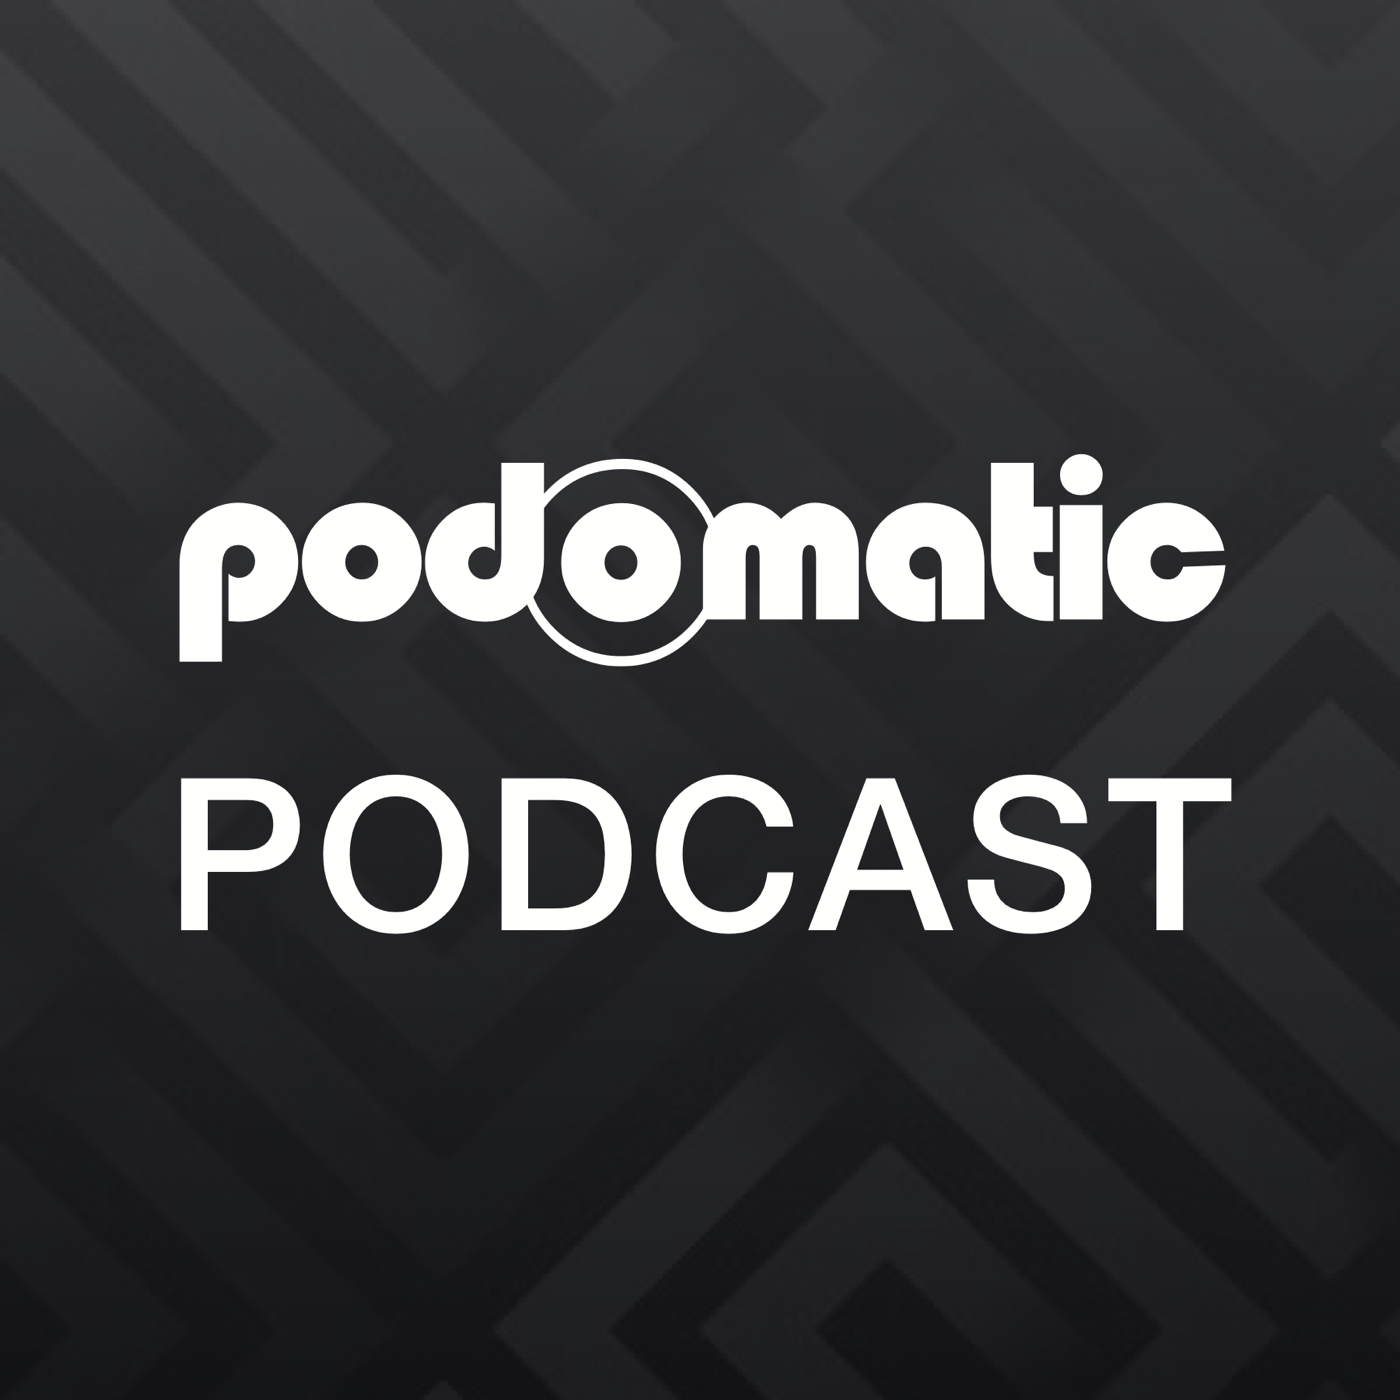 stuart robinson's Podcast